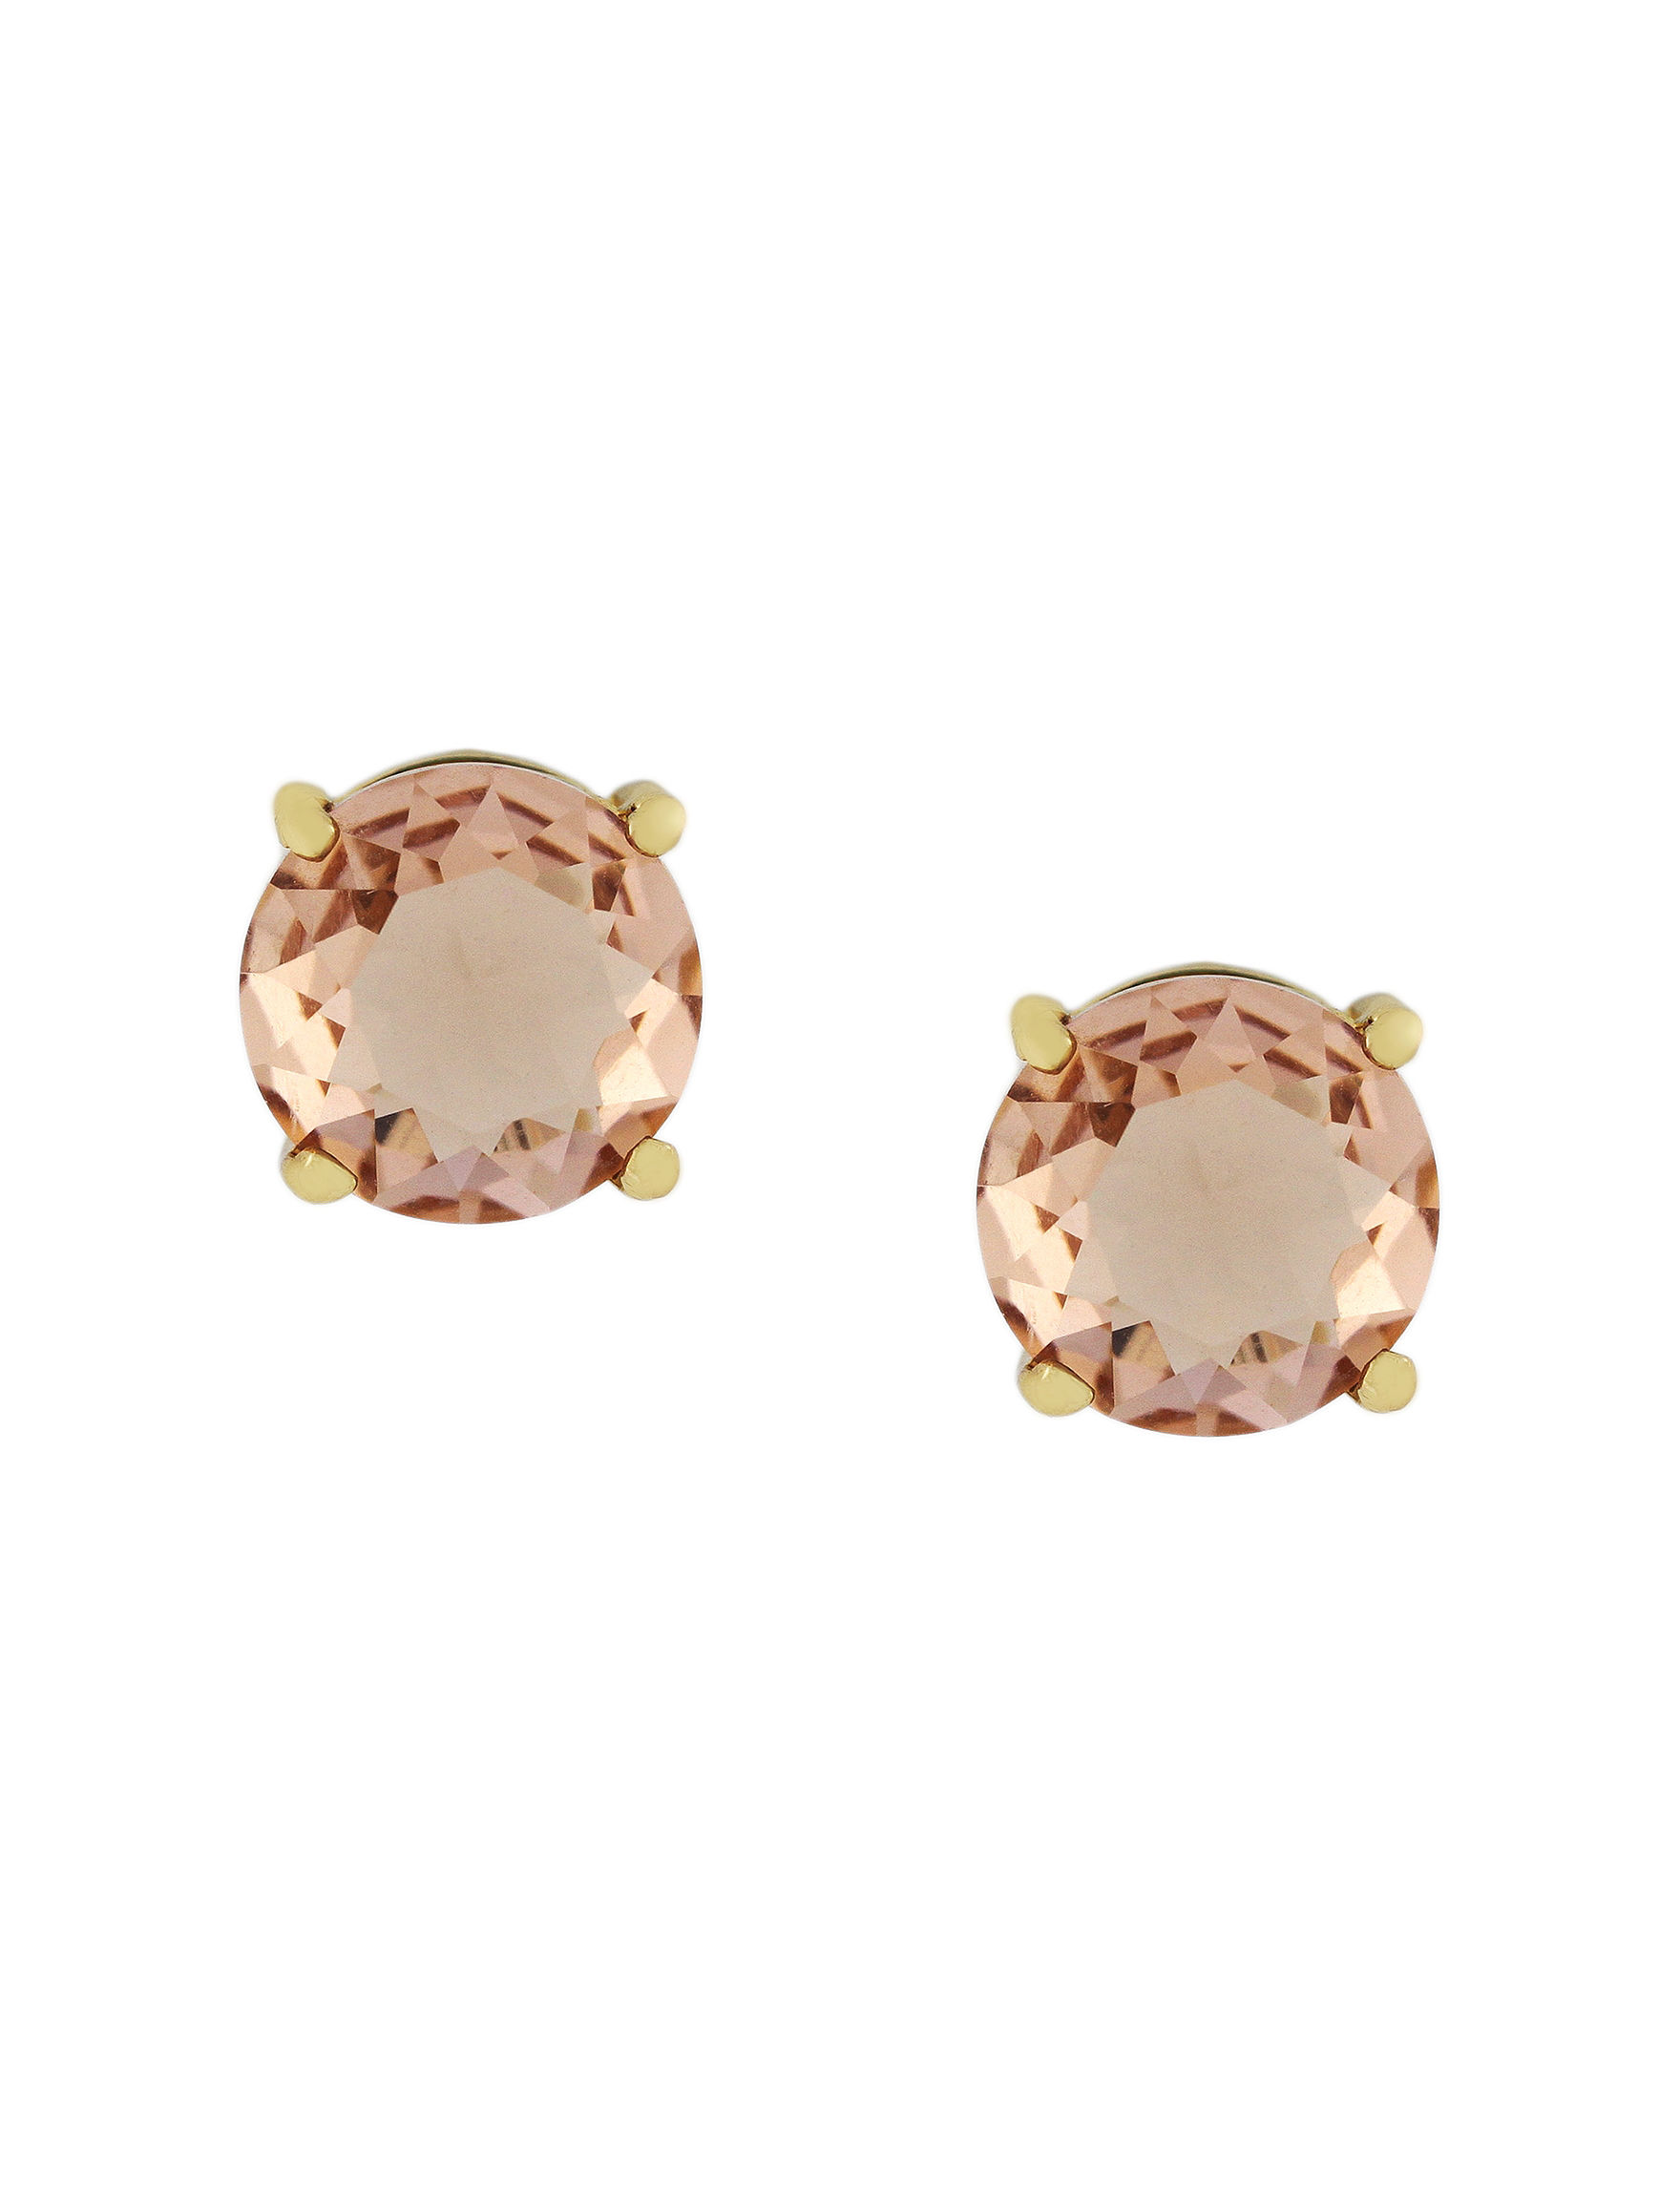 Jessica Simpson Gold Studs Earrings Fashion Jewelry